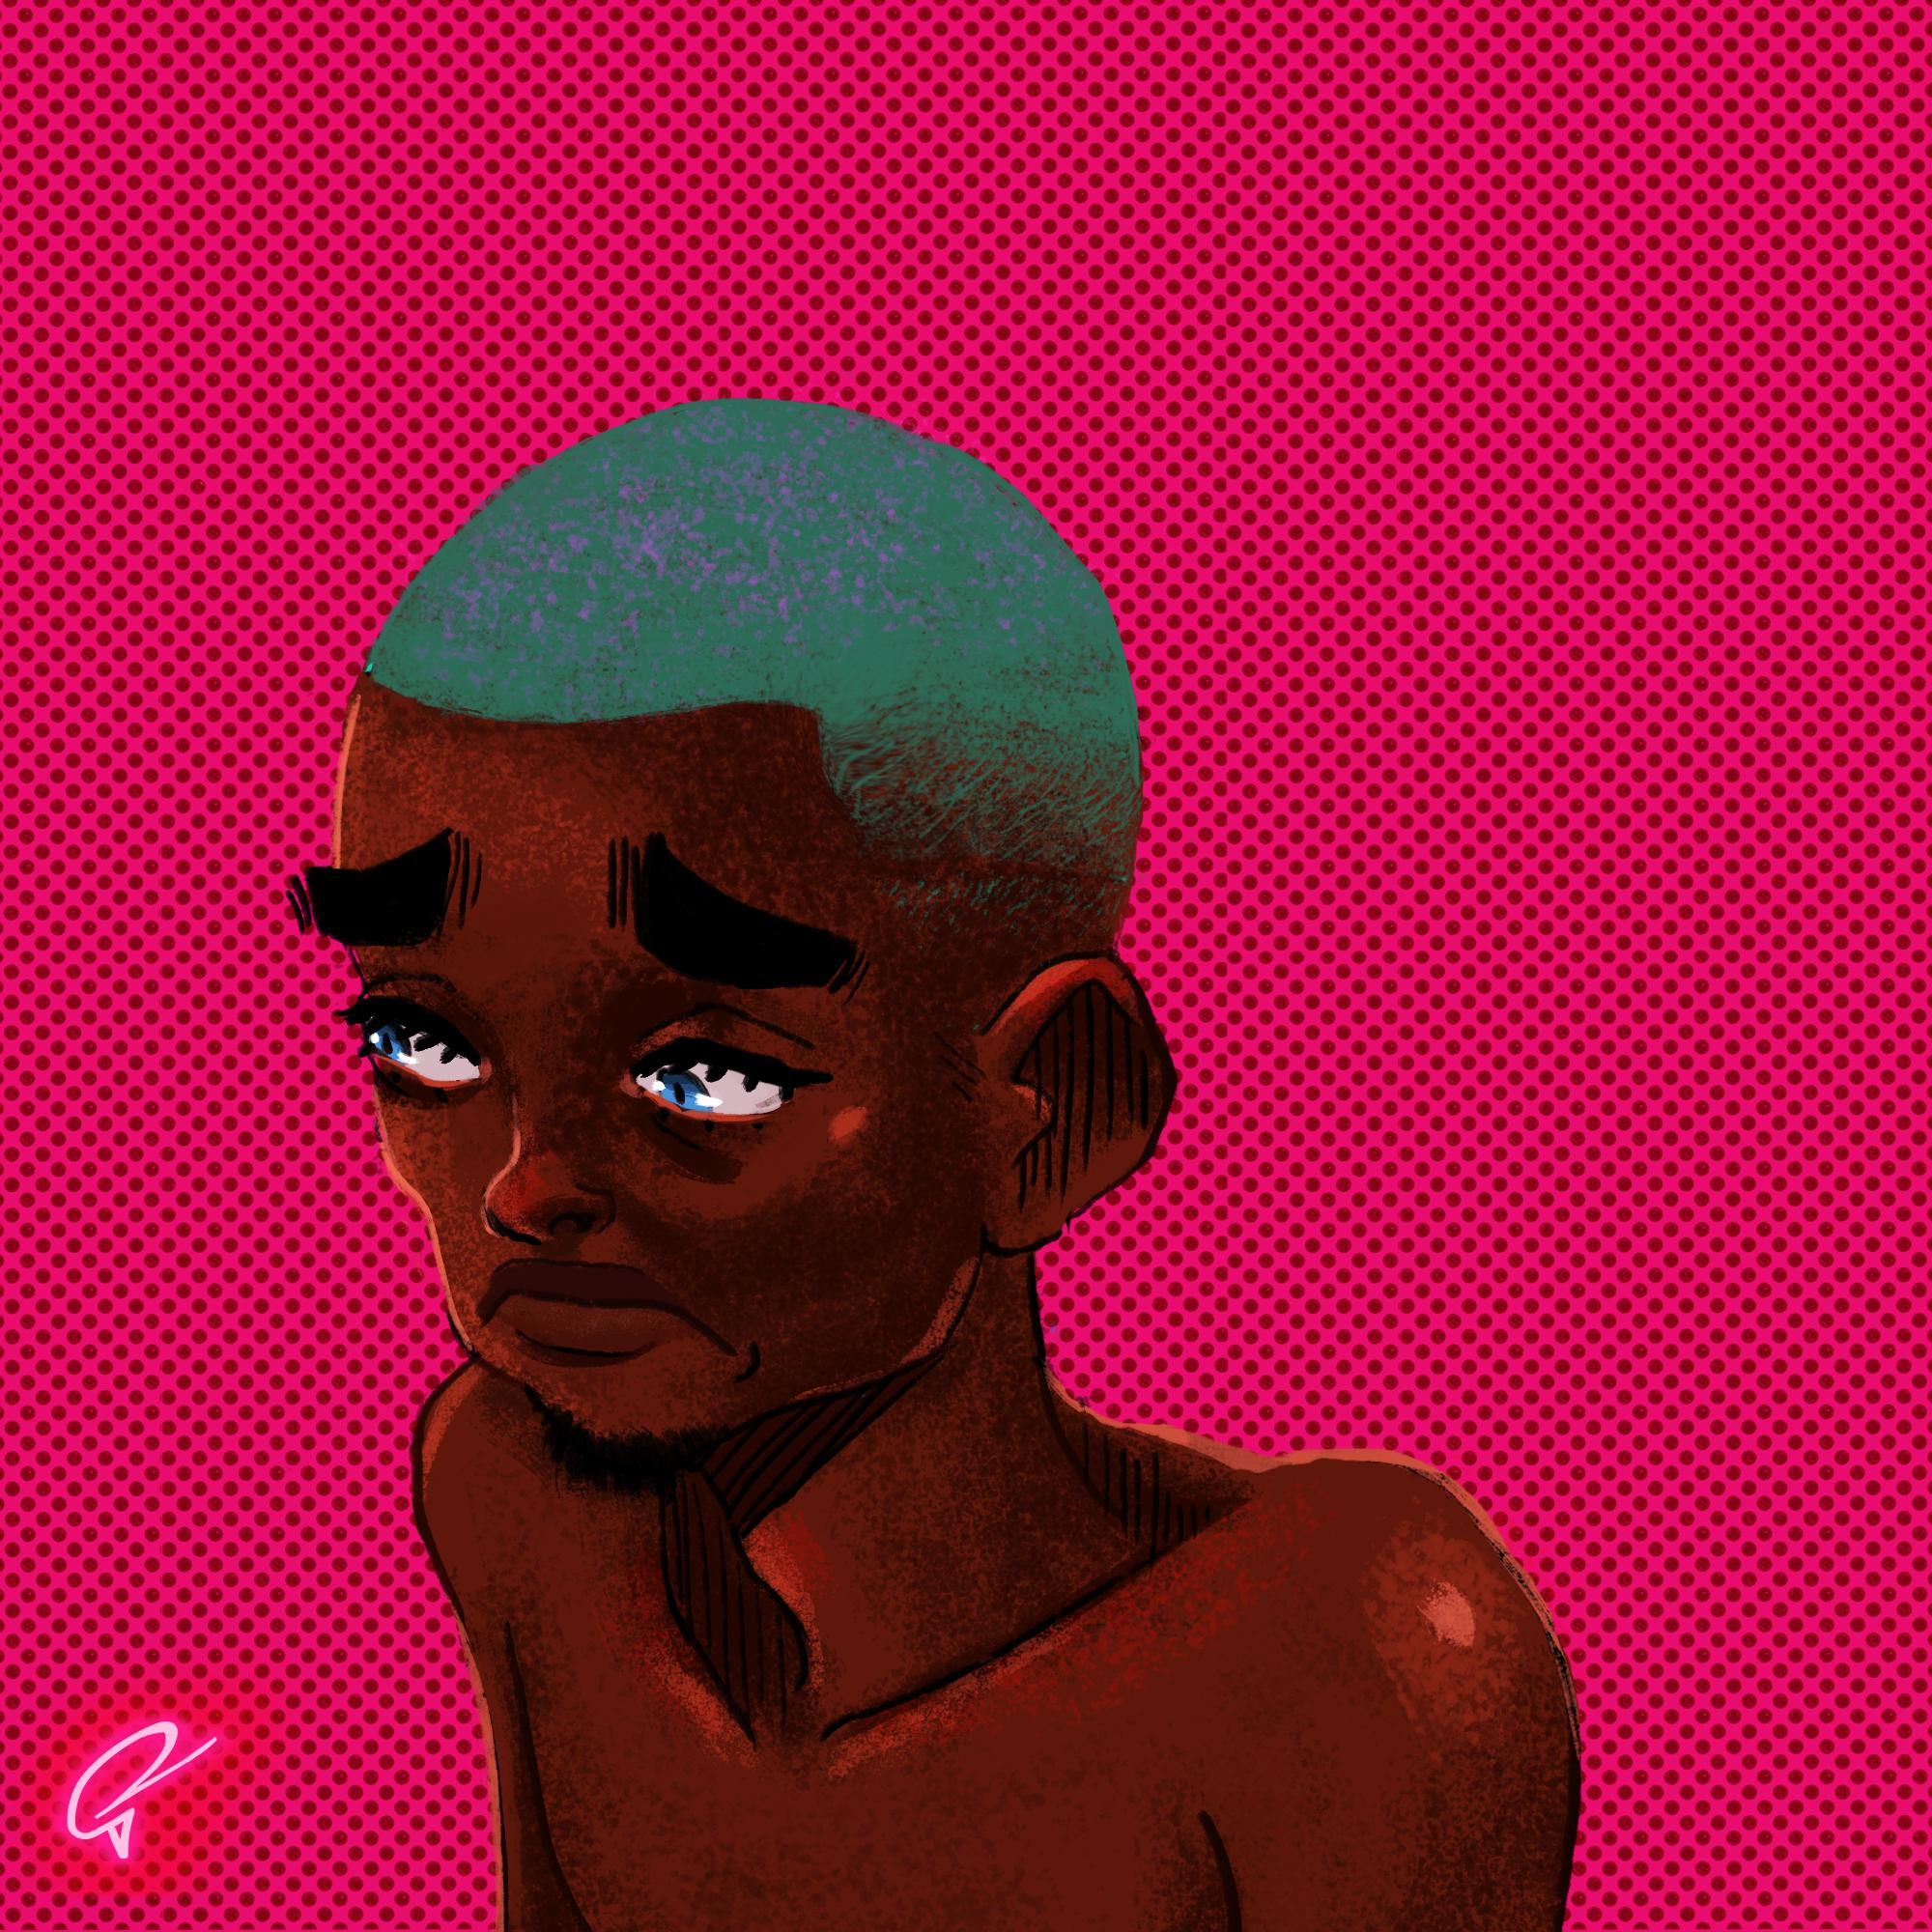 Sad by Shika